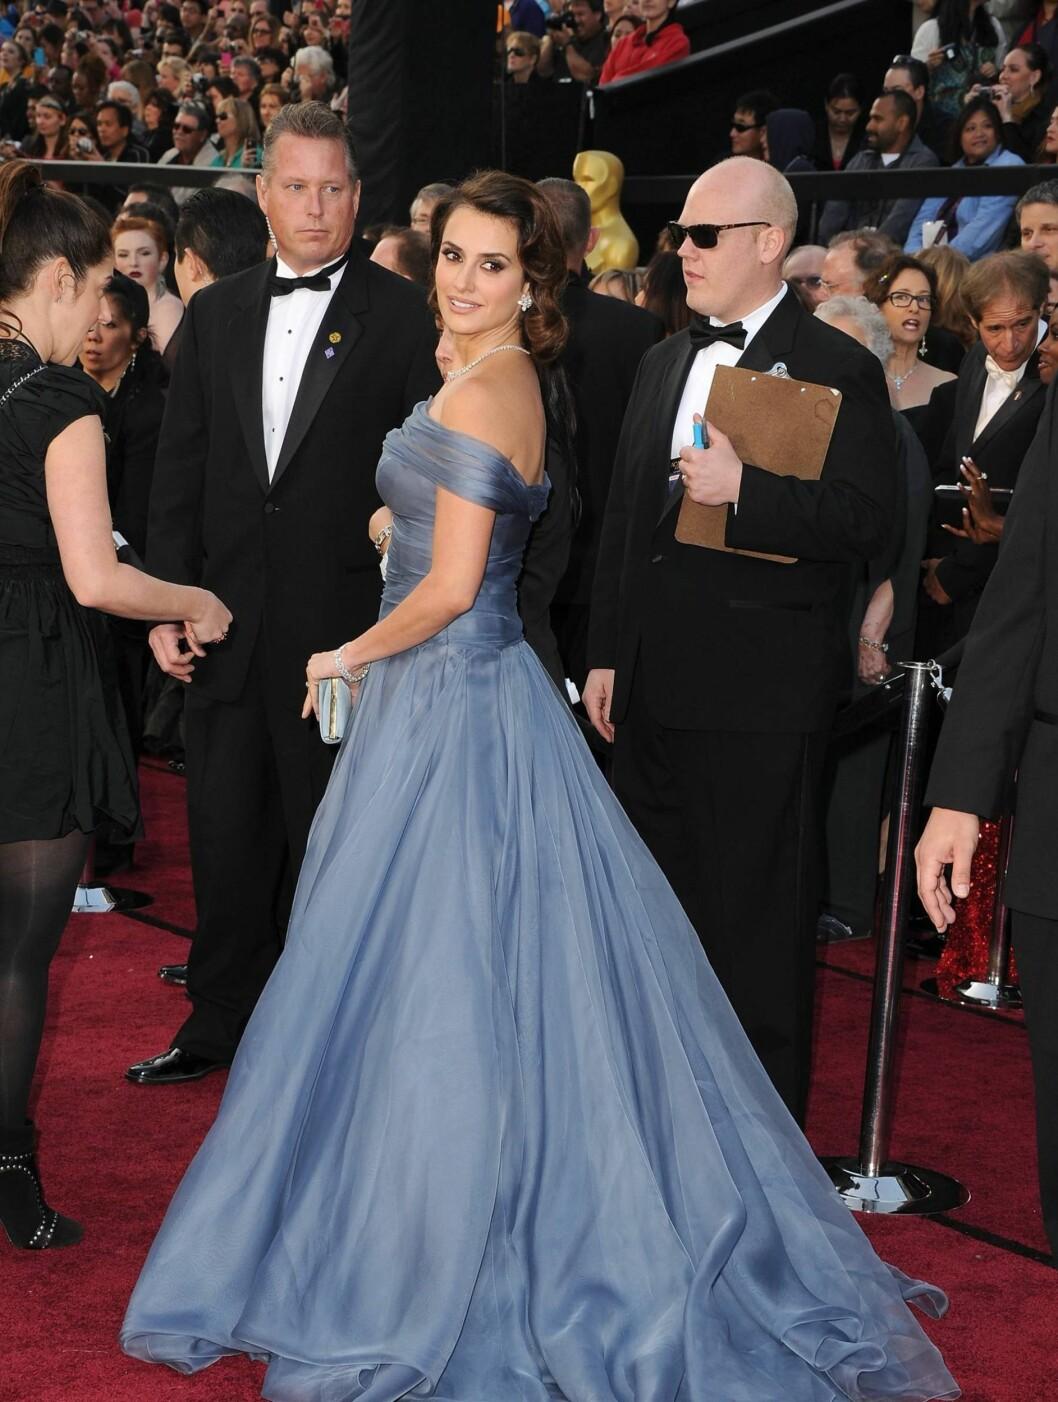 ELEGANT: Penelope Cruz var elegant i en klassisk blå tyllkjole fra Armani.  Foto: All Over Press